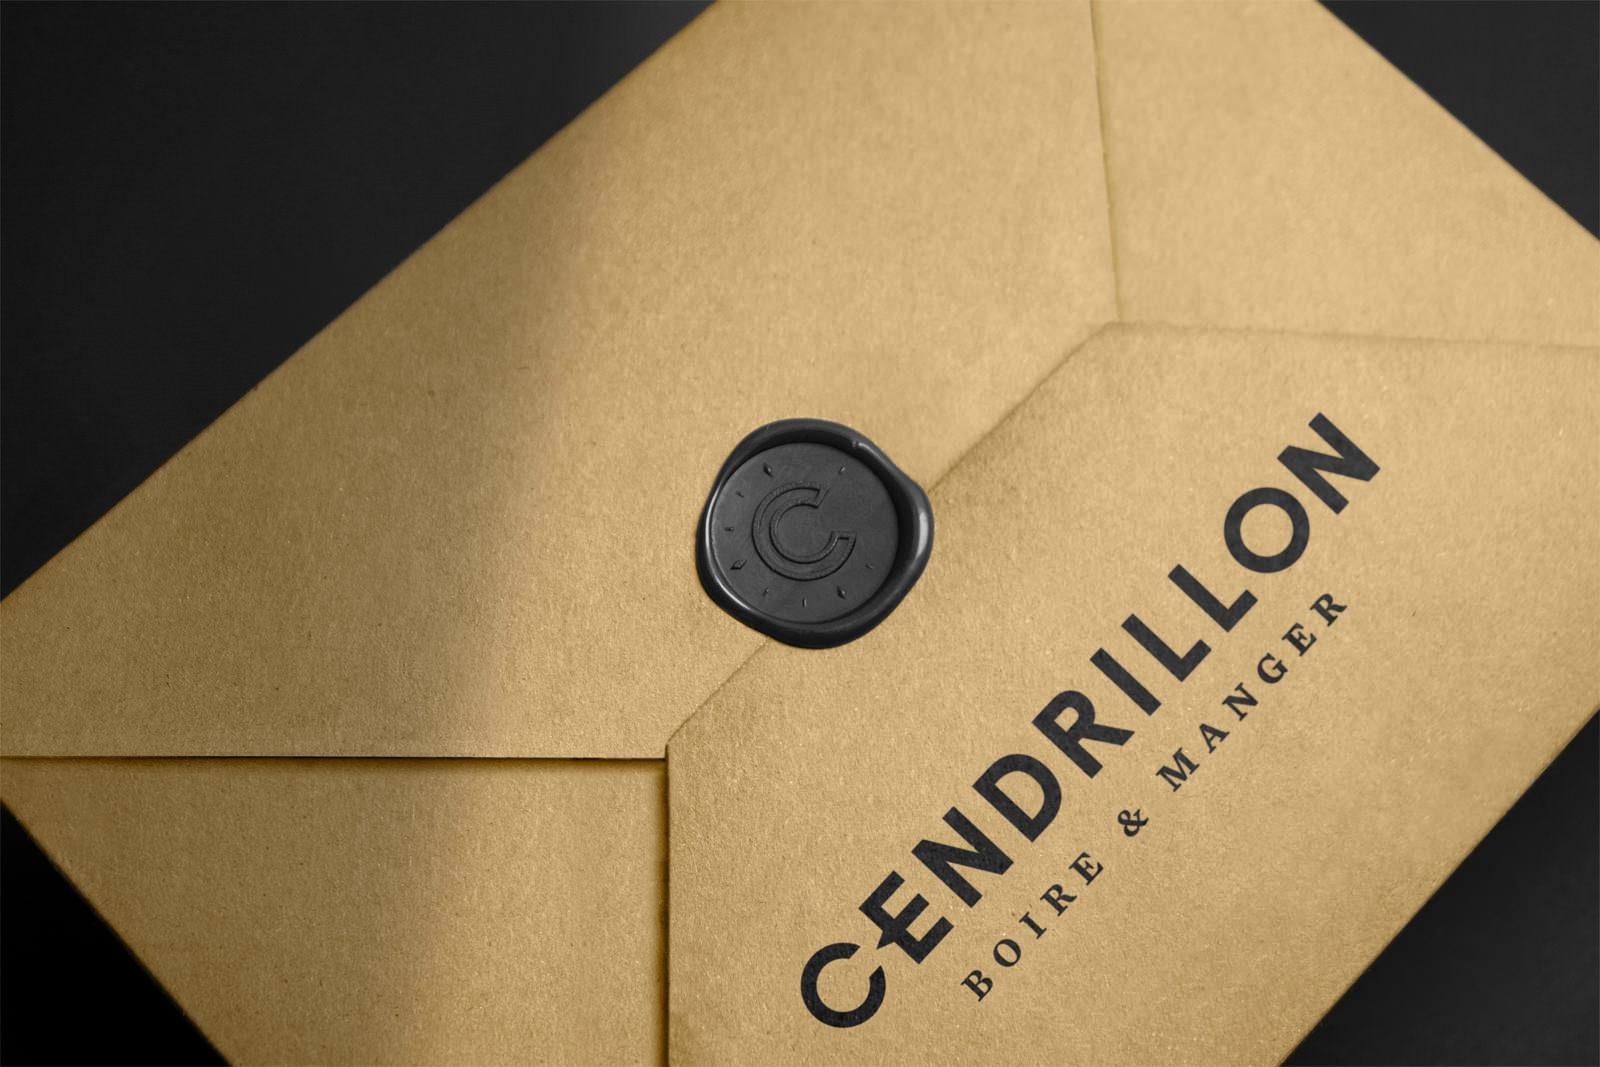 Figure-Jeremy-Hall-Design-Graphique-Logo-Branding-Image-De-Marque-Cendrillon-Restaurant-Emballage-23.jpg